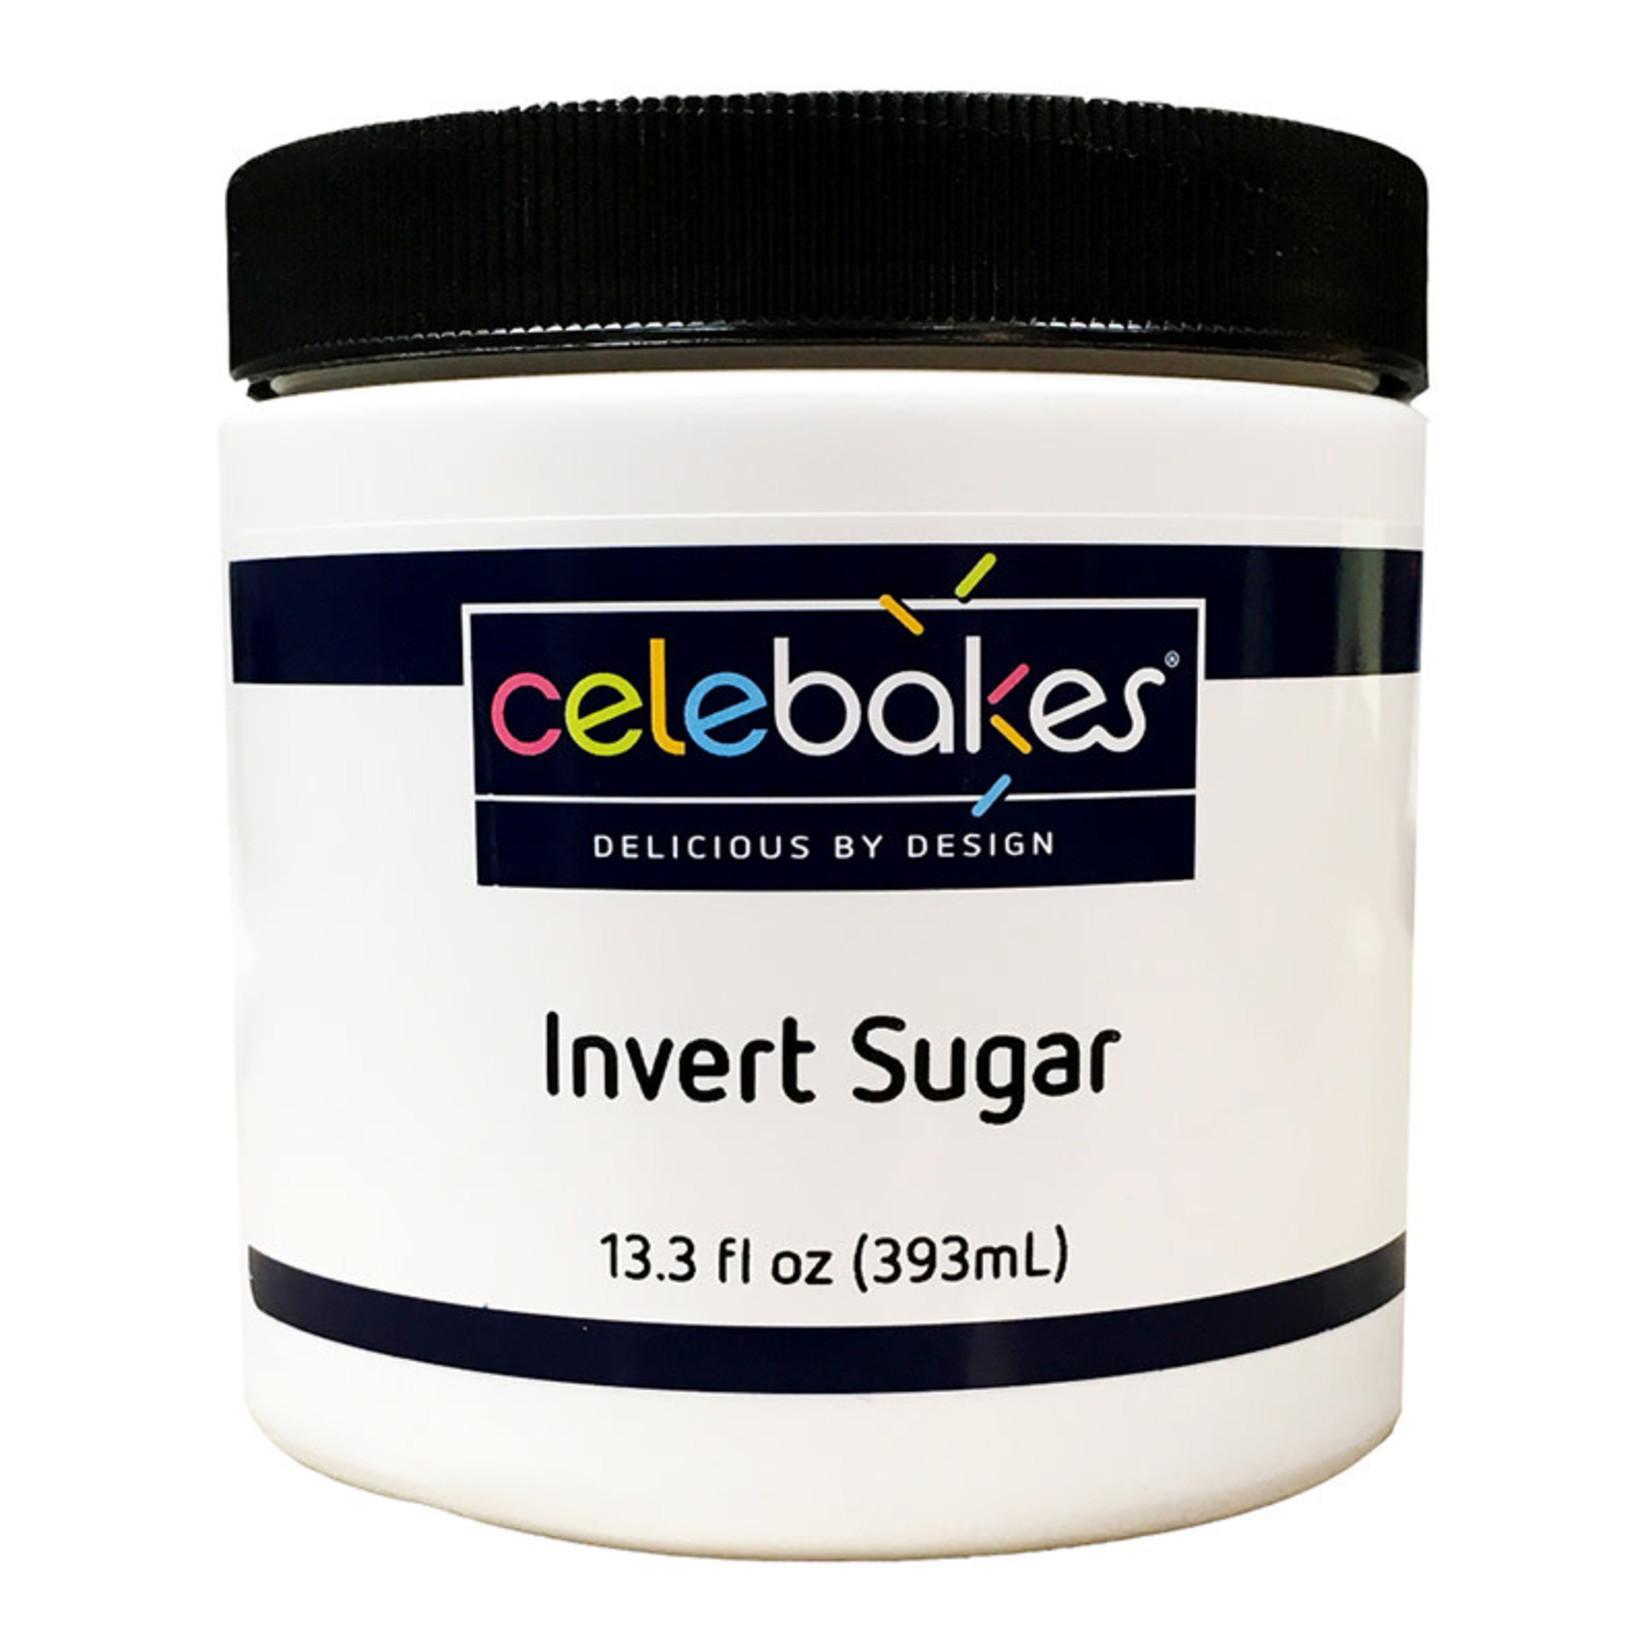 CK Invert Sugar - 13.3 oz, 7500-766002